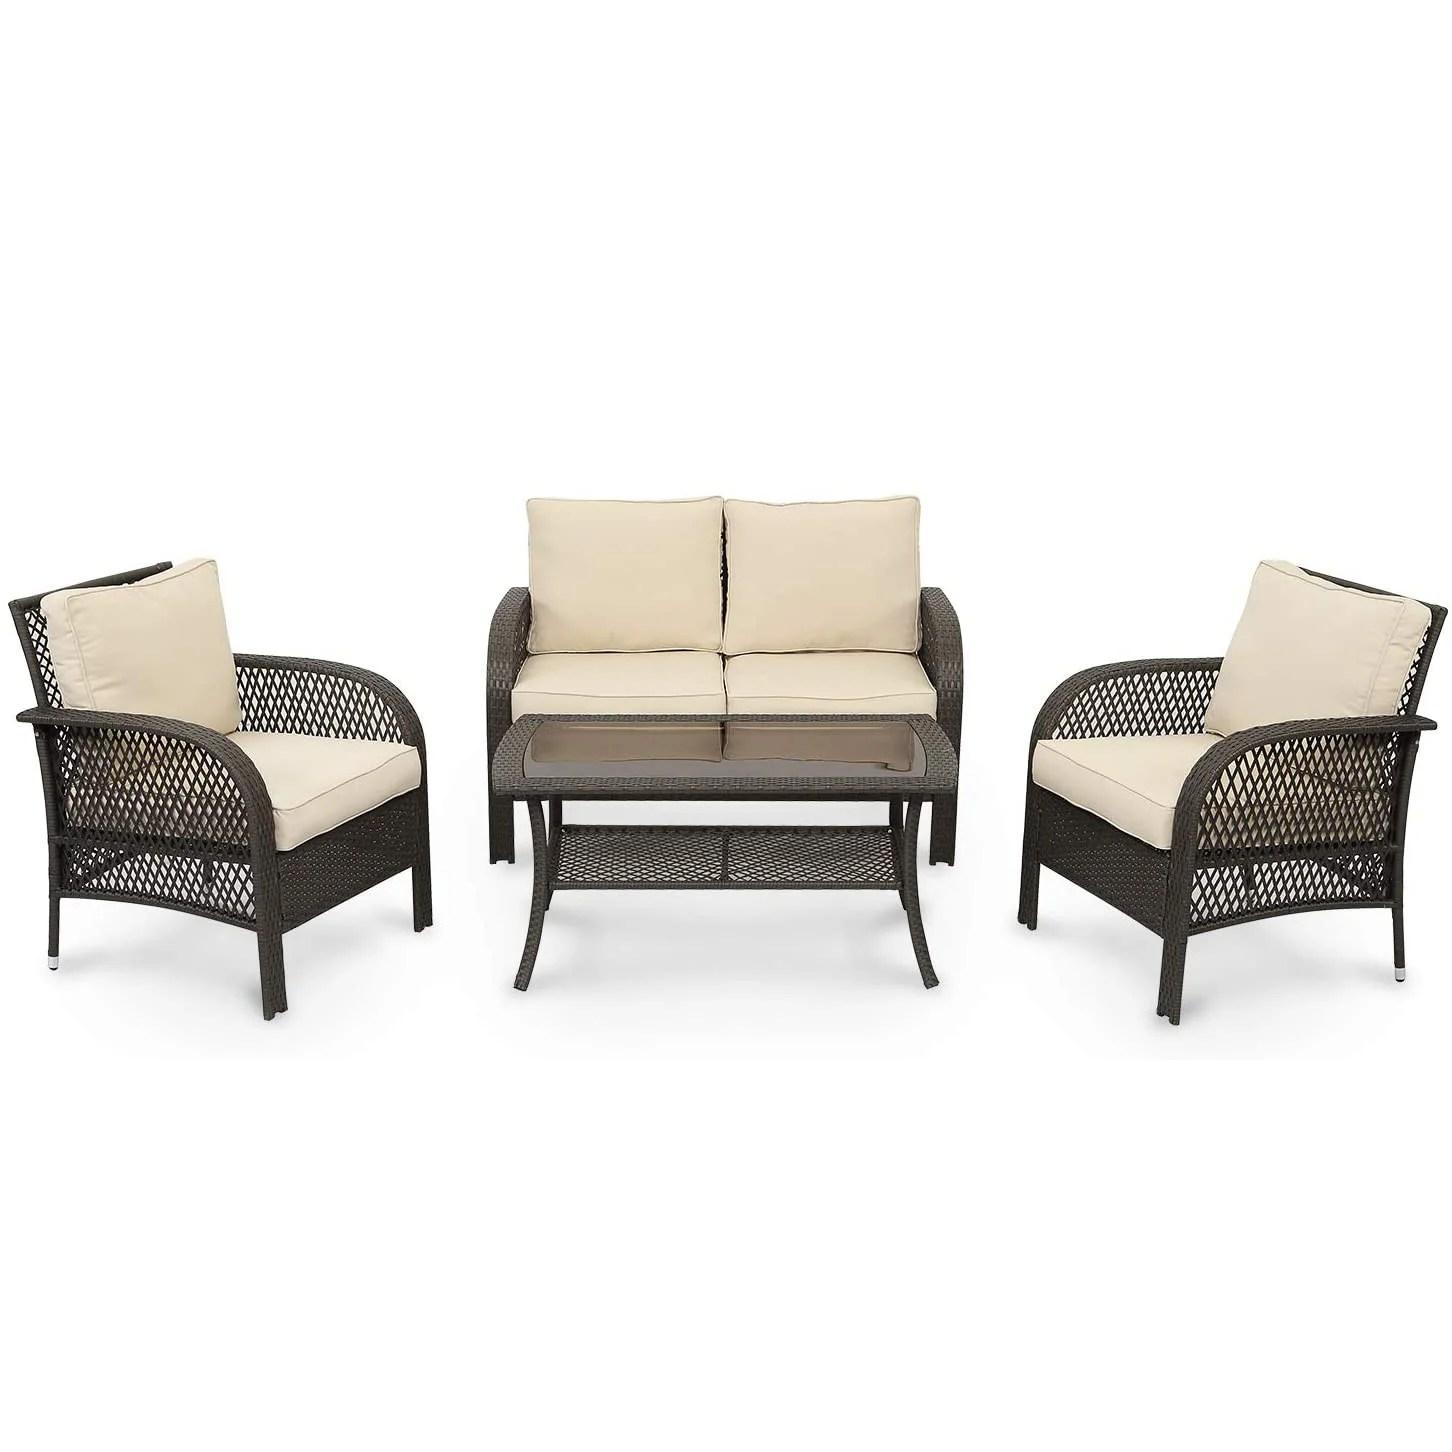 4 piece gray pe wicker rattan patio furniture set with gray cushuon